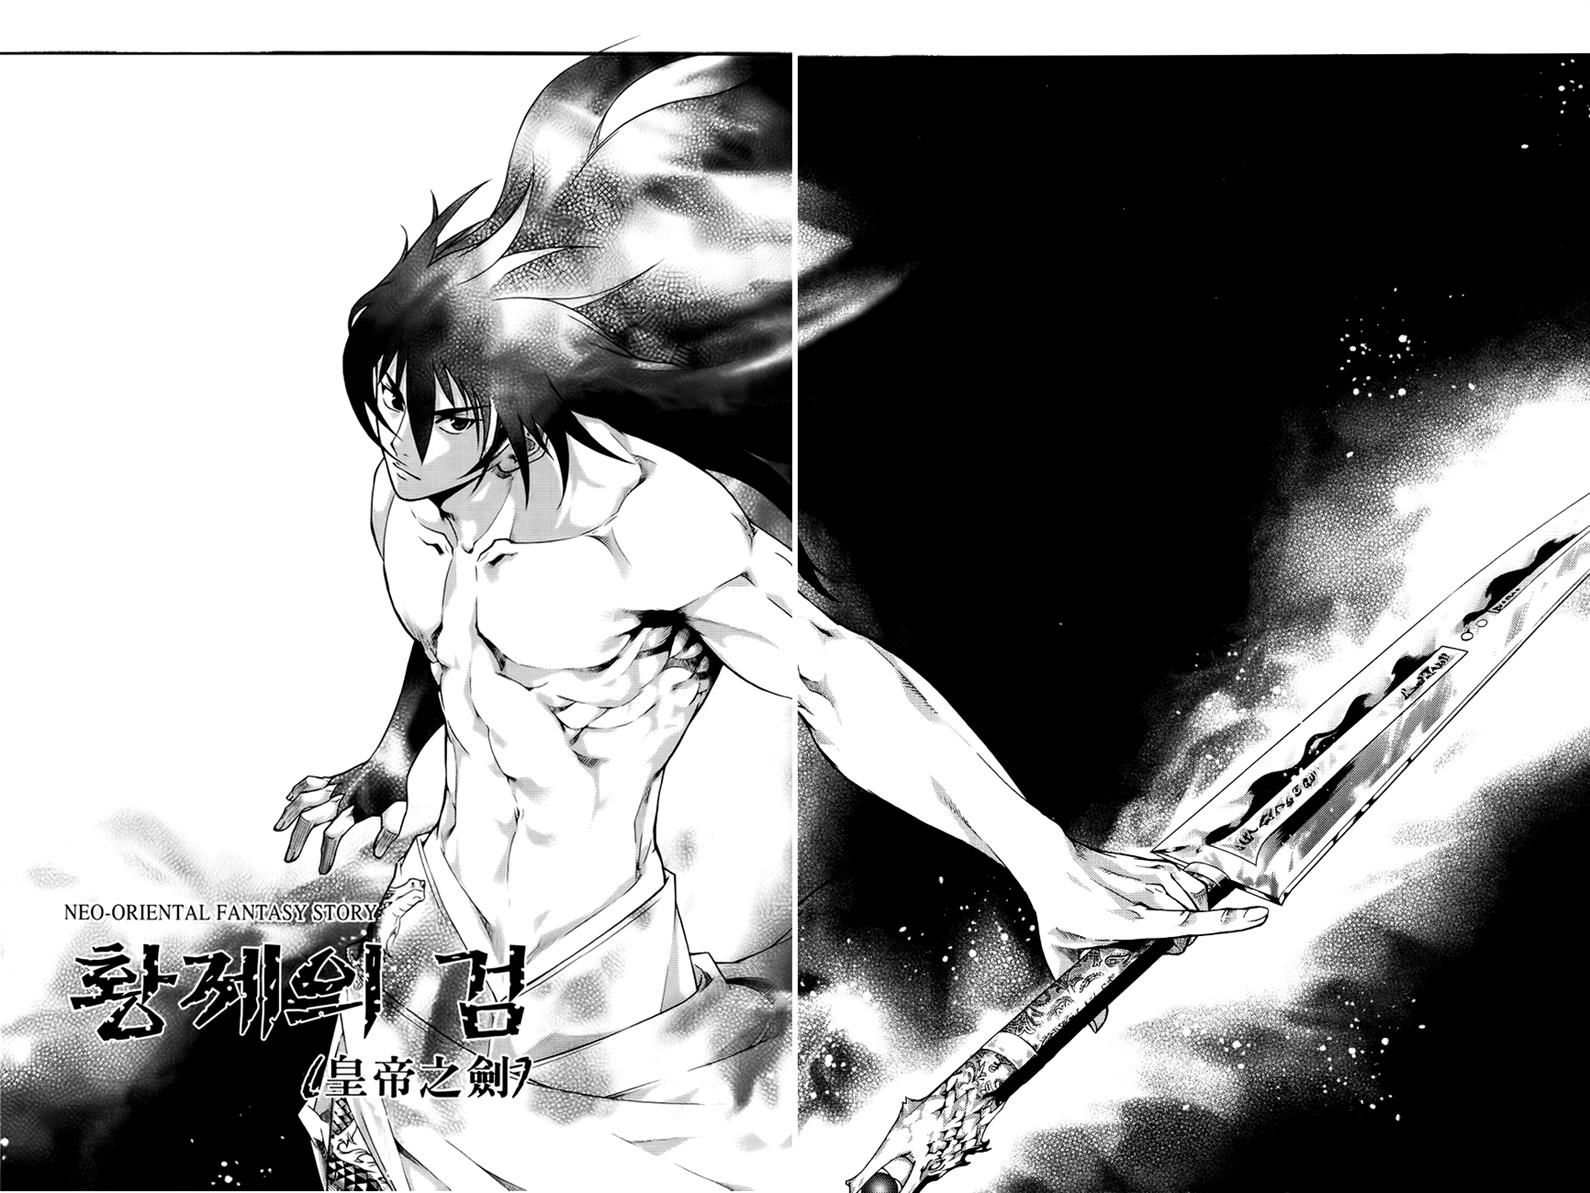 The Sword of Emperor 43 Page 1